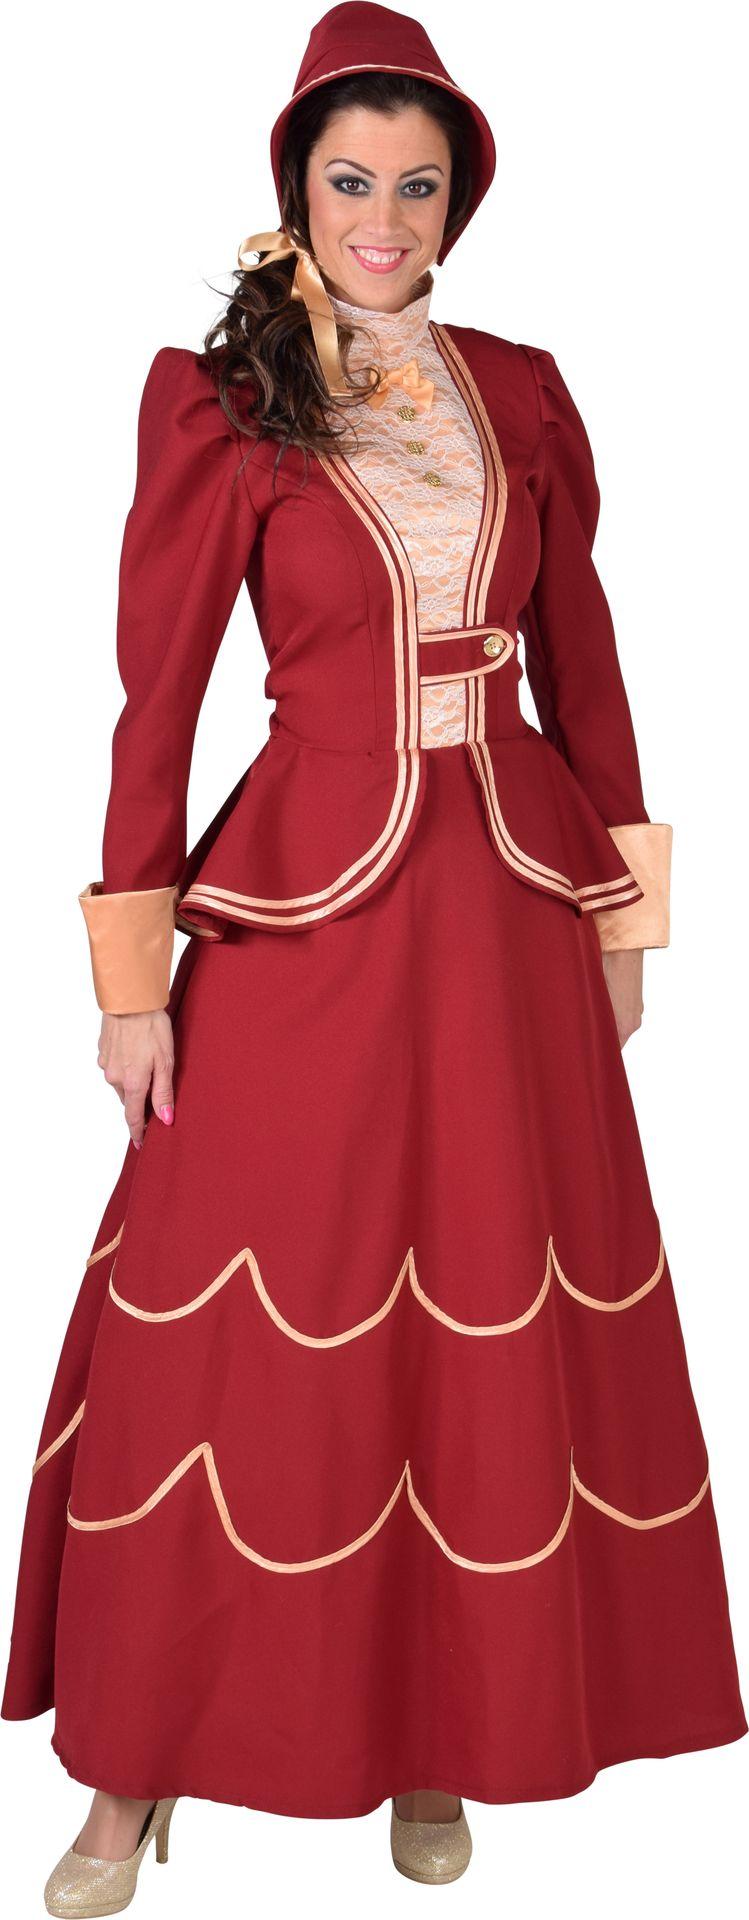 Dickens dames jurk